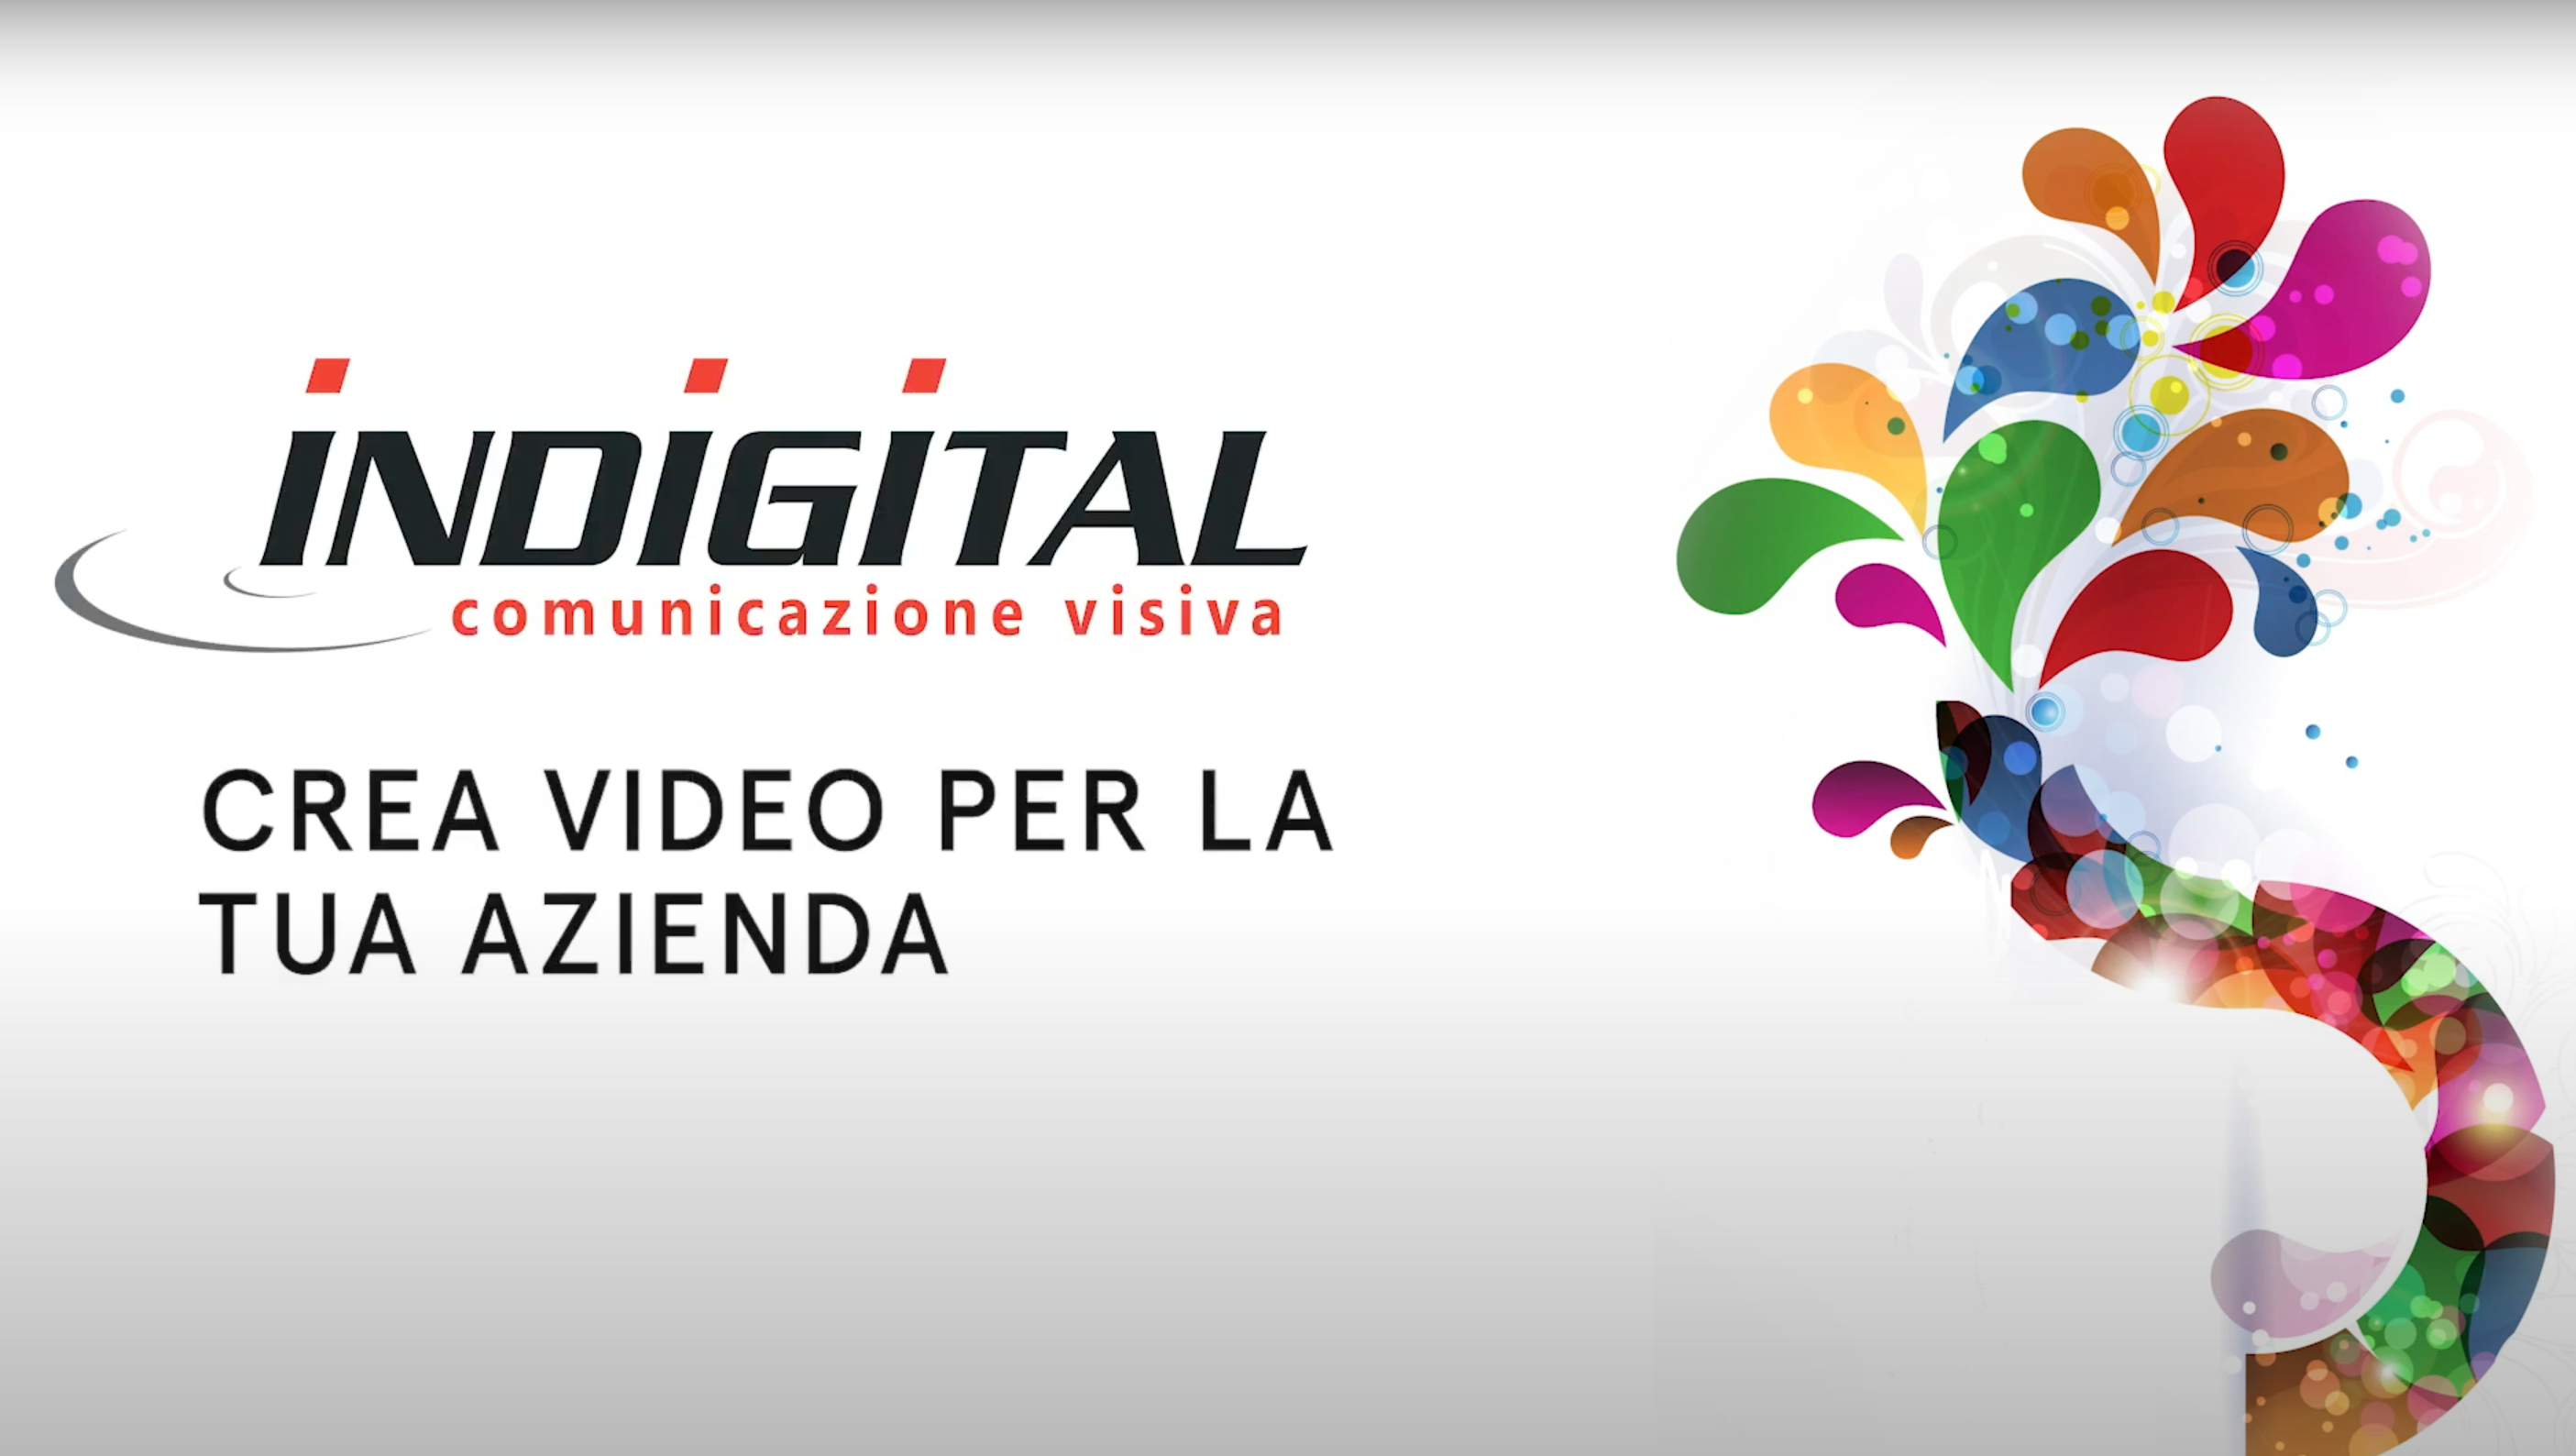 Indigital TV Channel